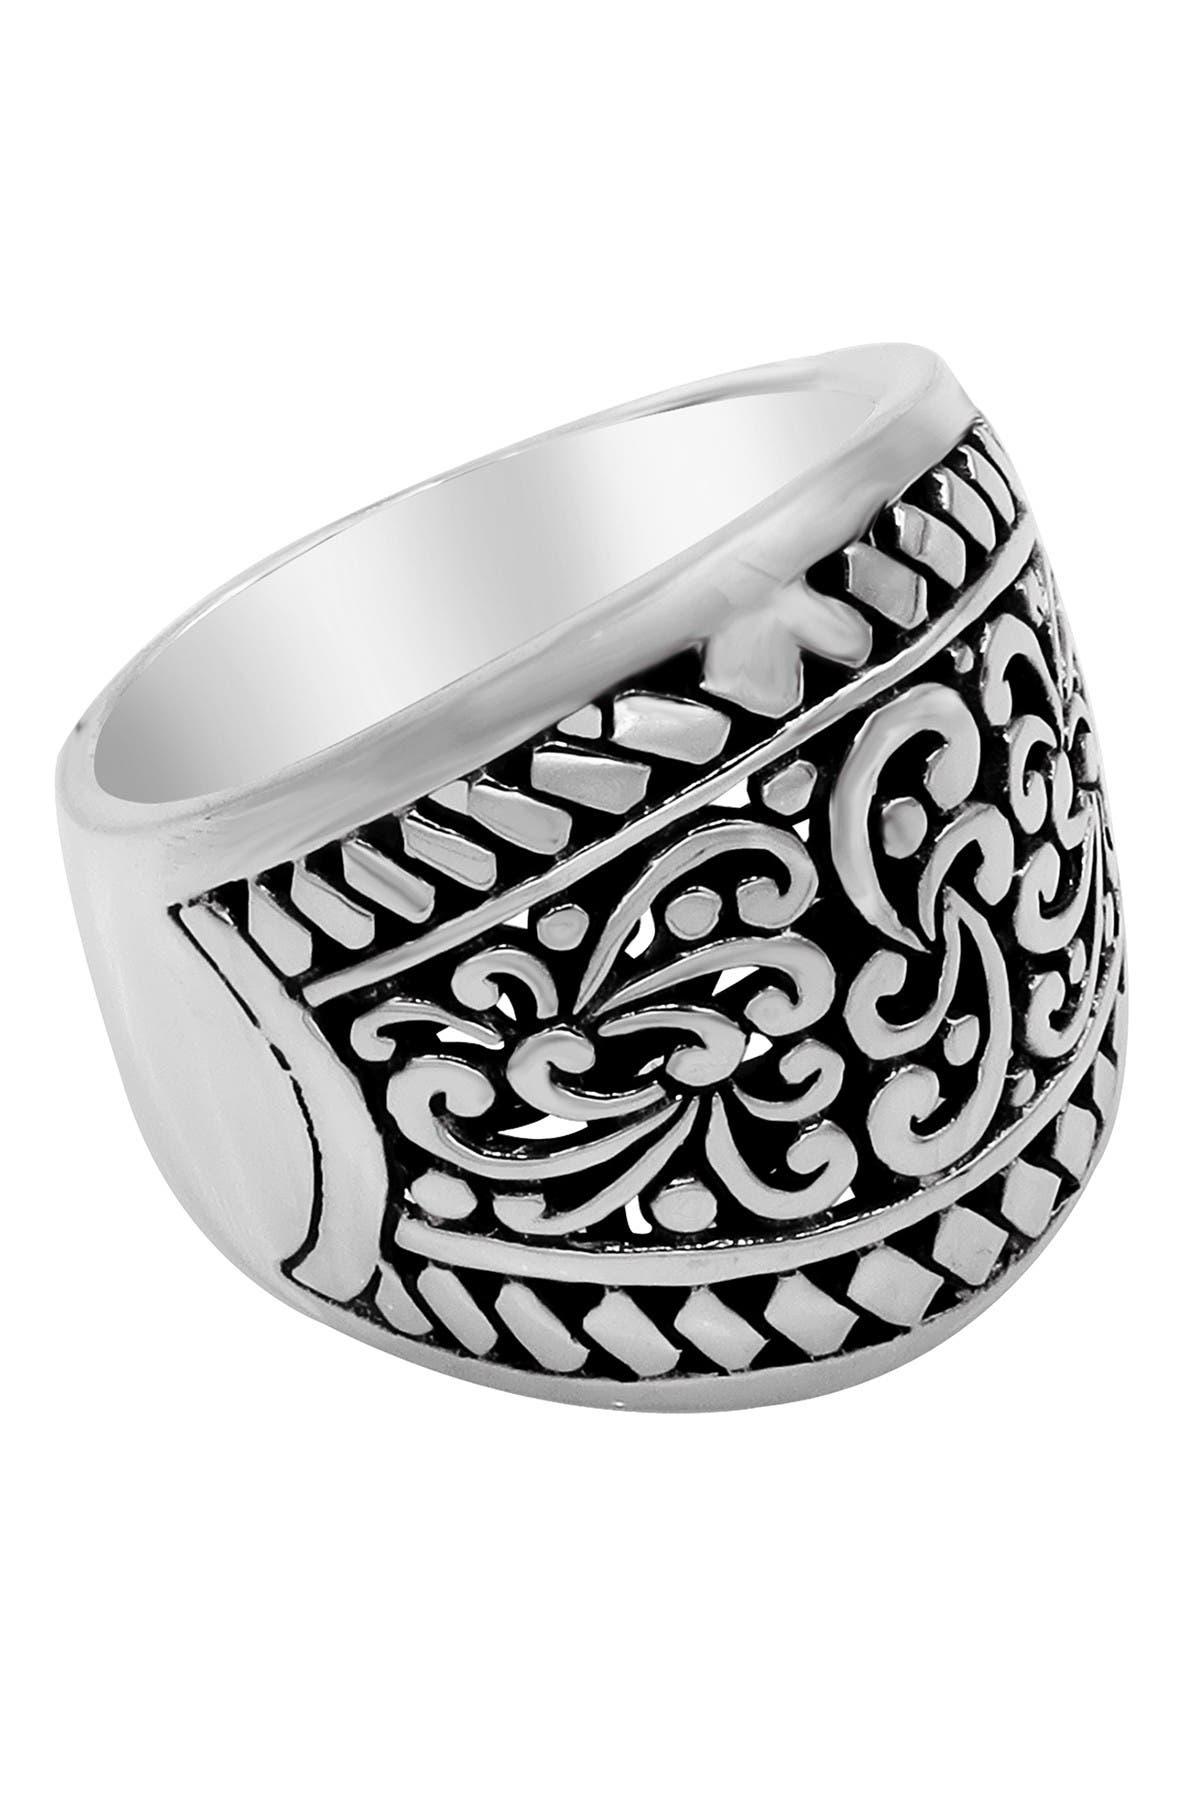 Image of DEVATA Sterling Silver Bali Filigree Wide Dome Ring